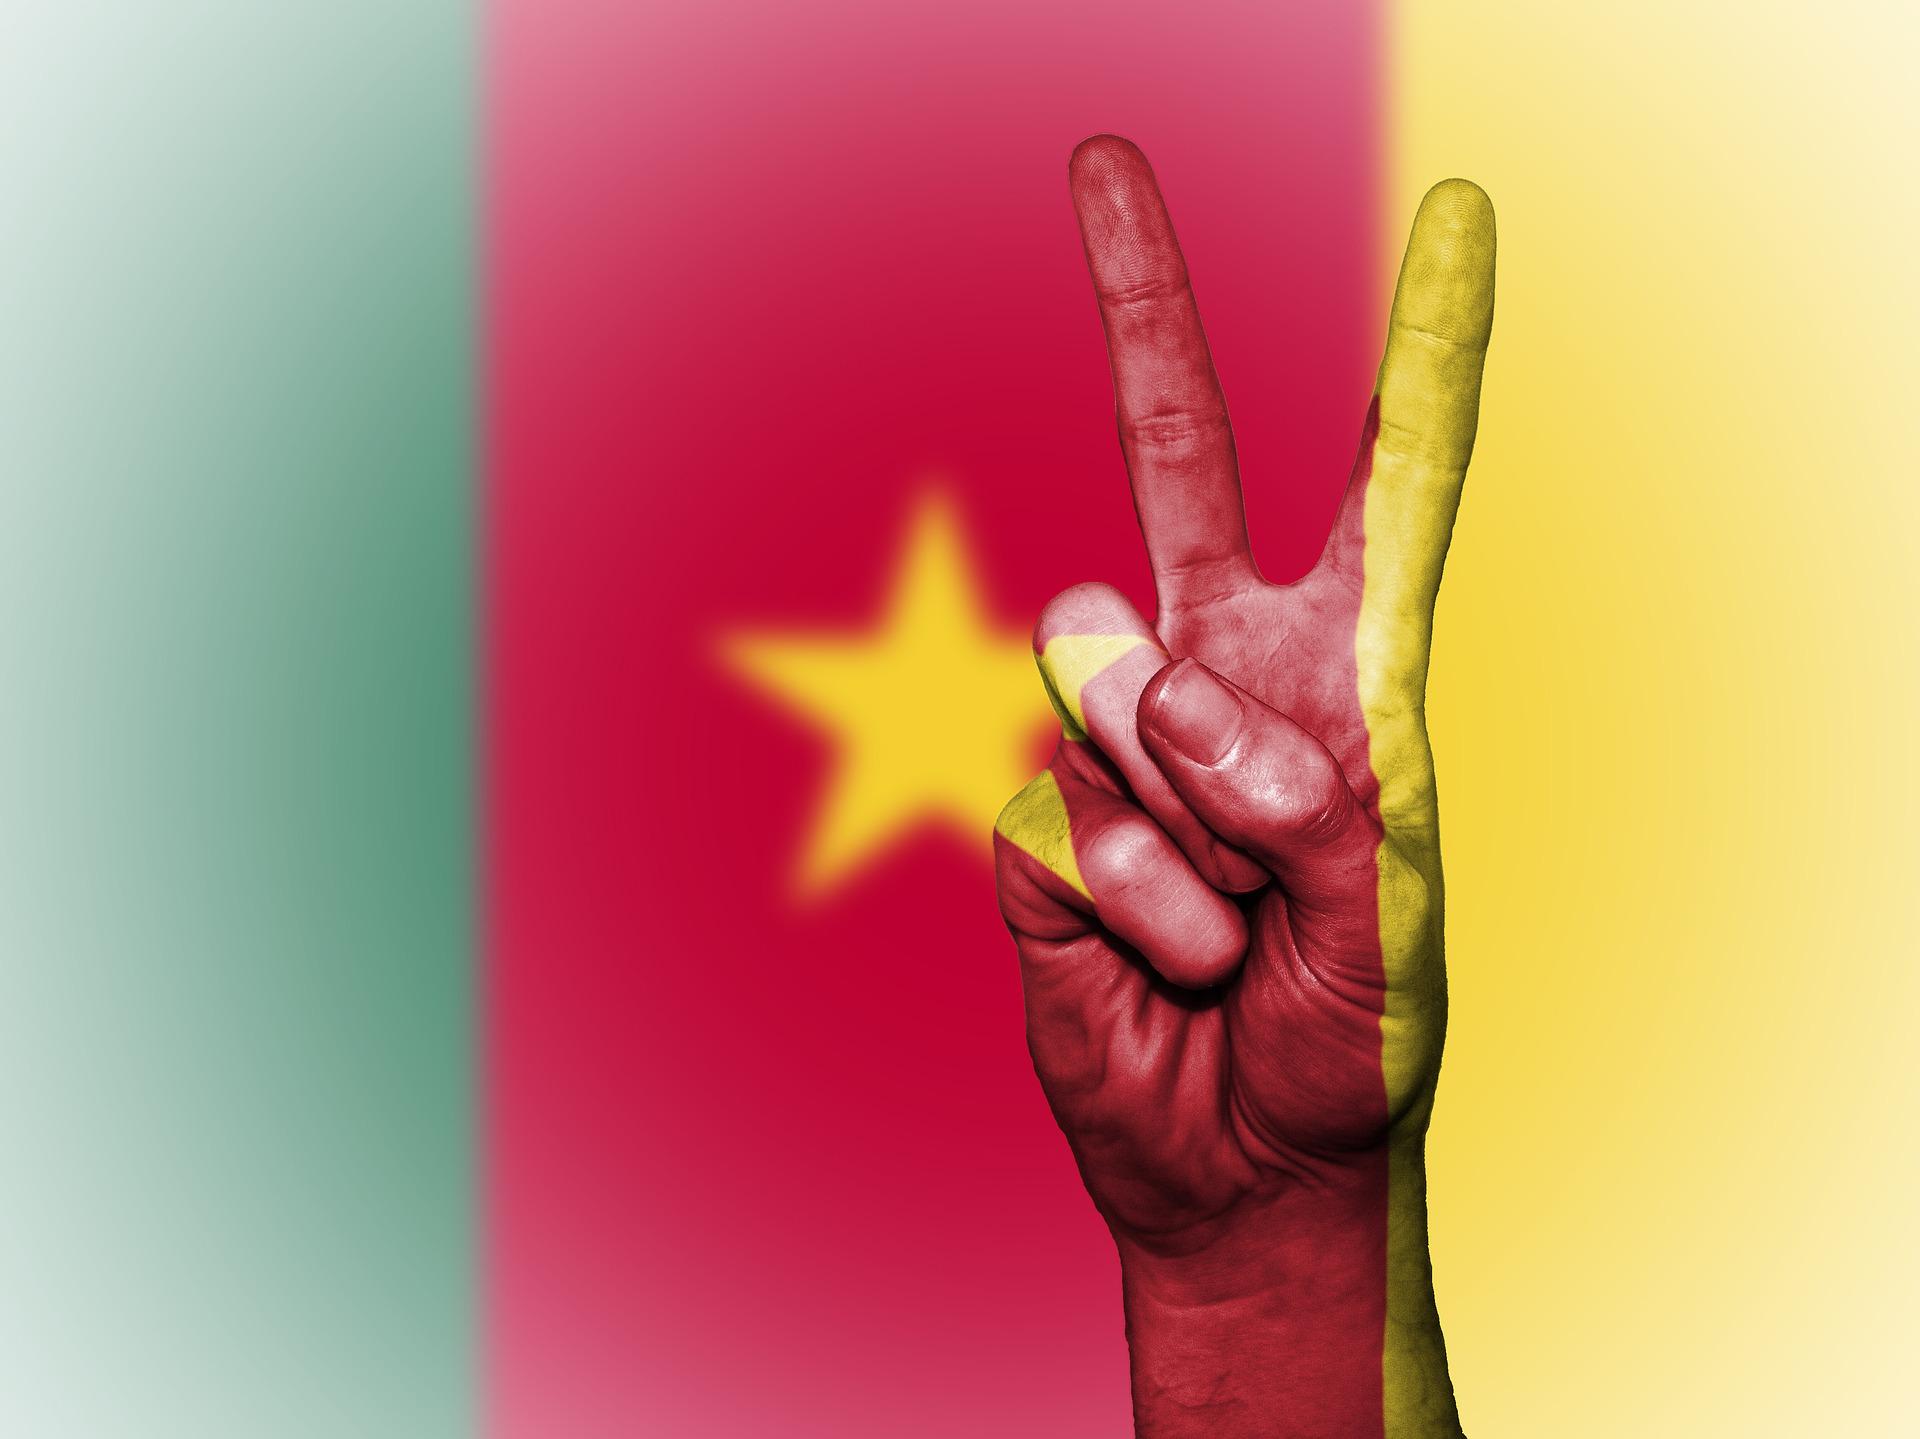 Cheap international calls to Cameroon